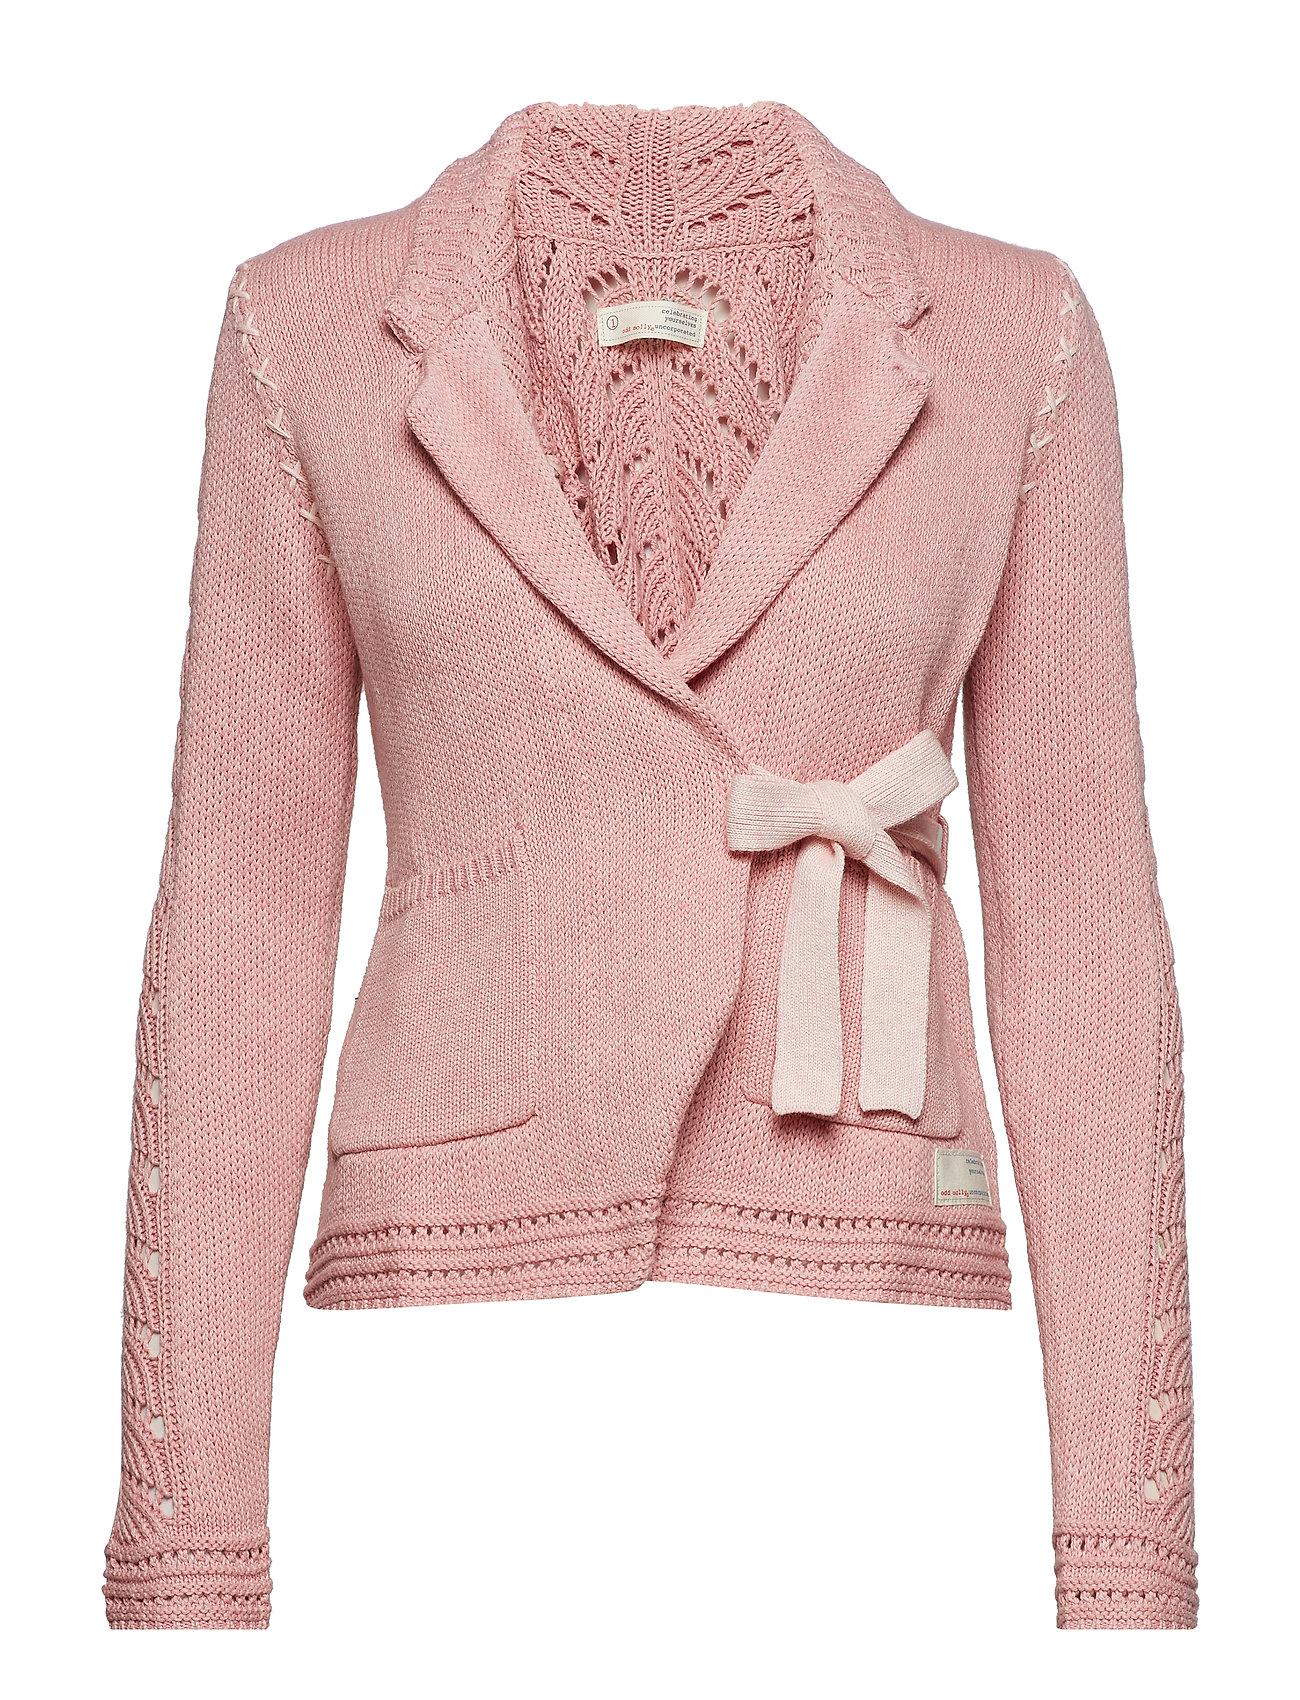 ODD MOLLY mrs charming cardigan - ROSE